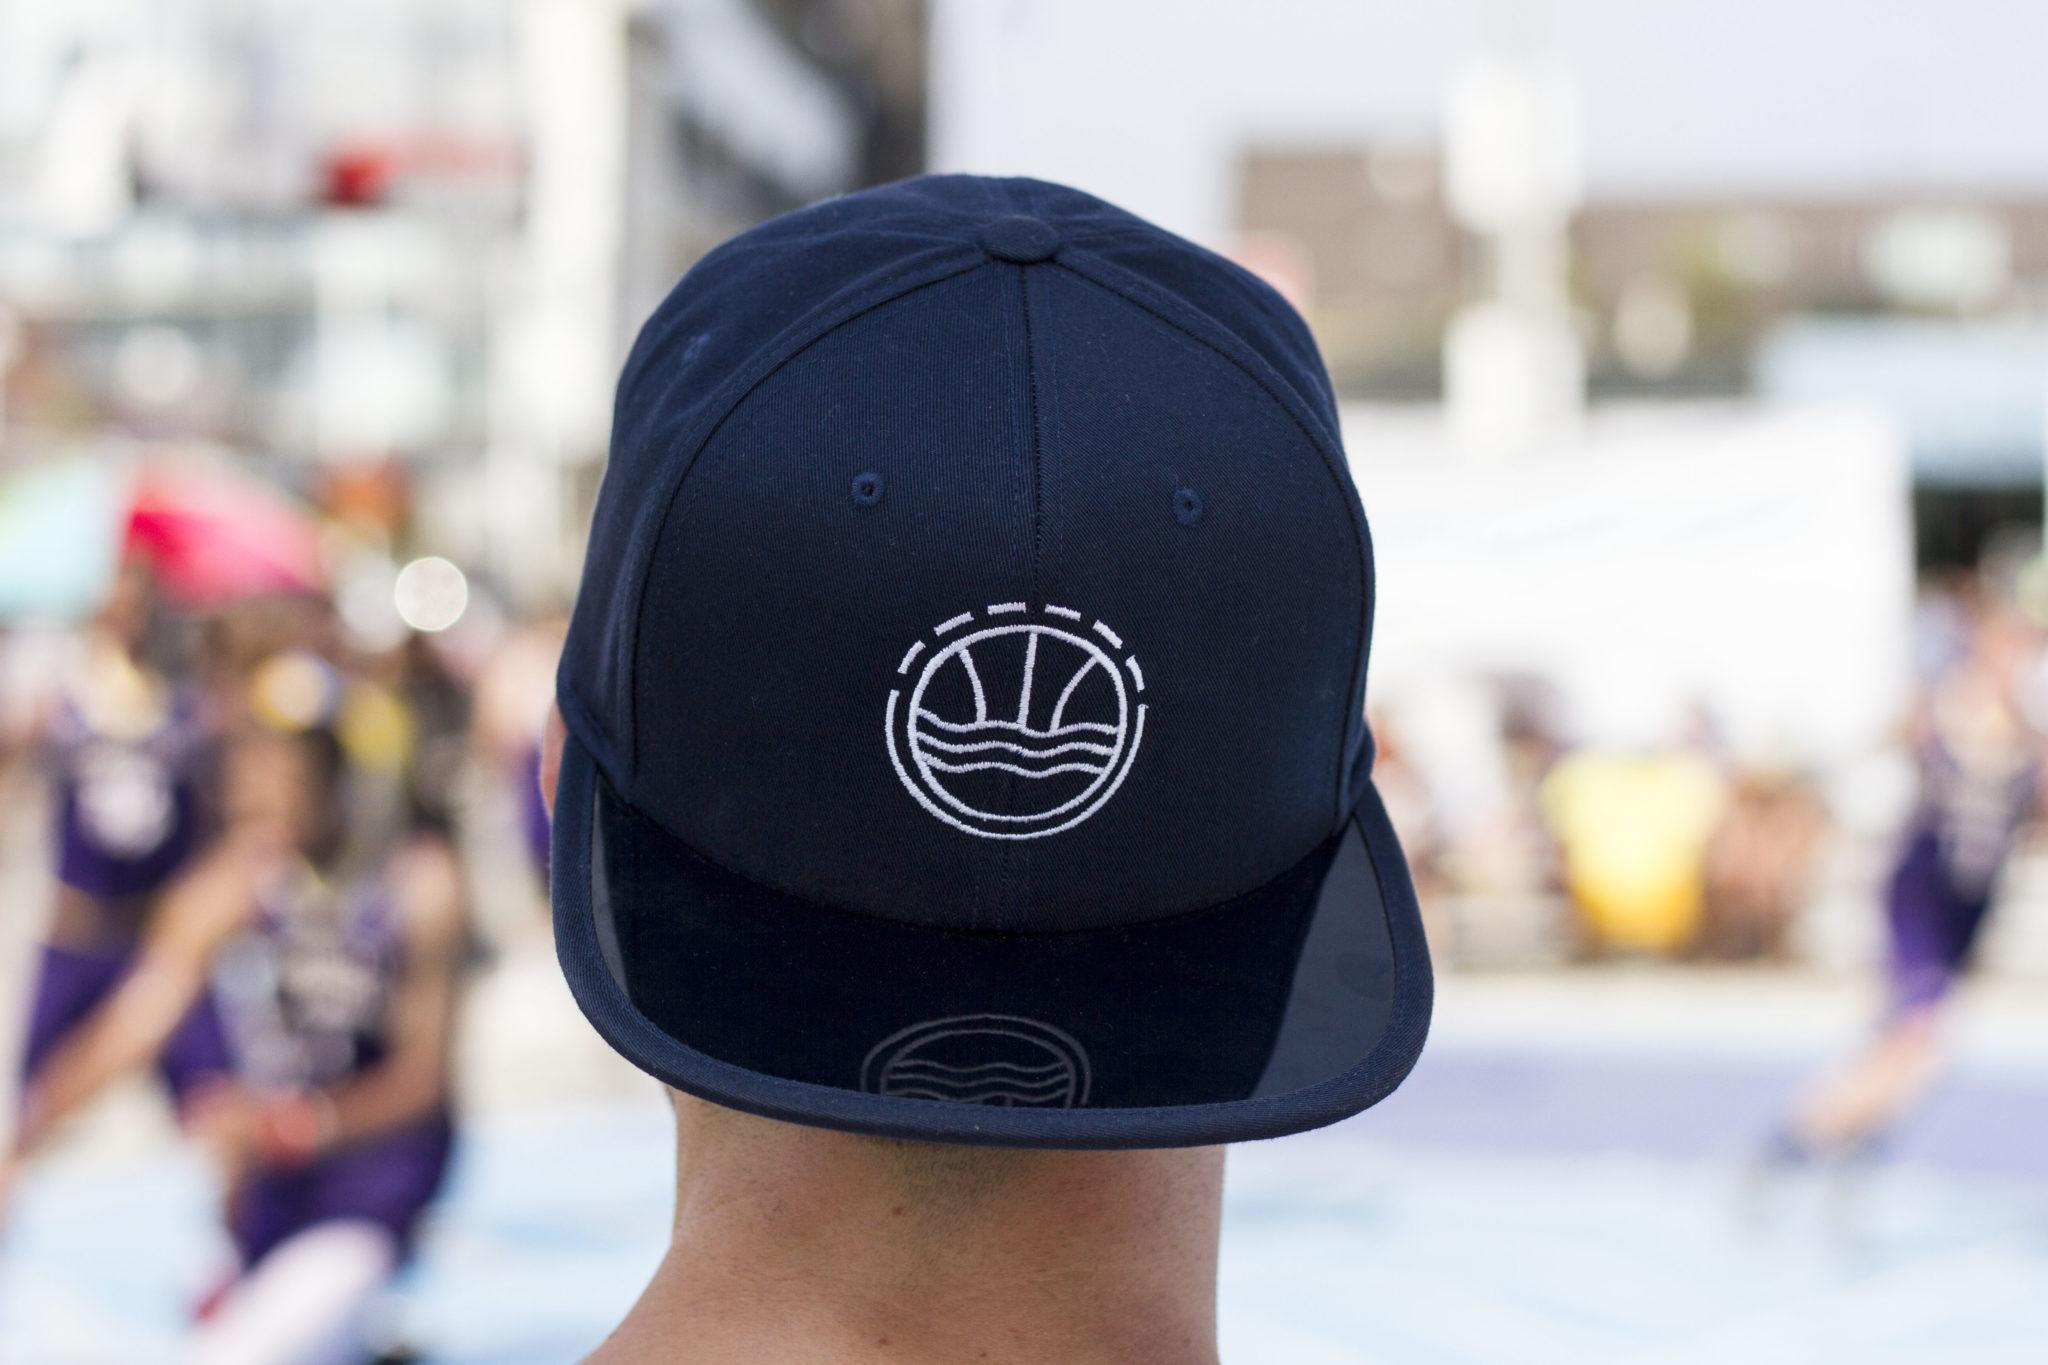 Venice Basketball League Brings the Heat in Week 6